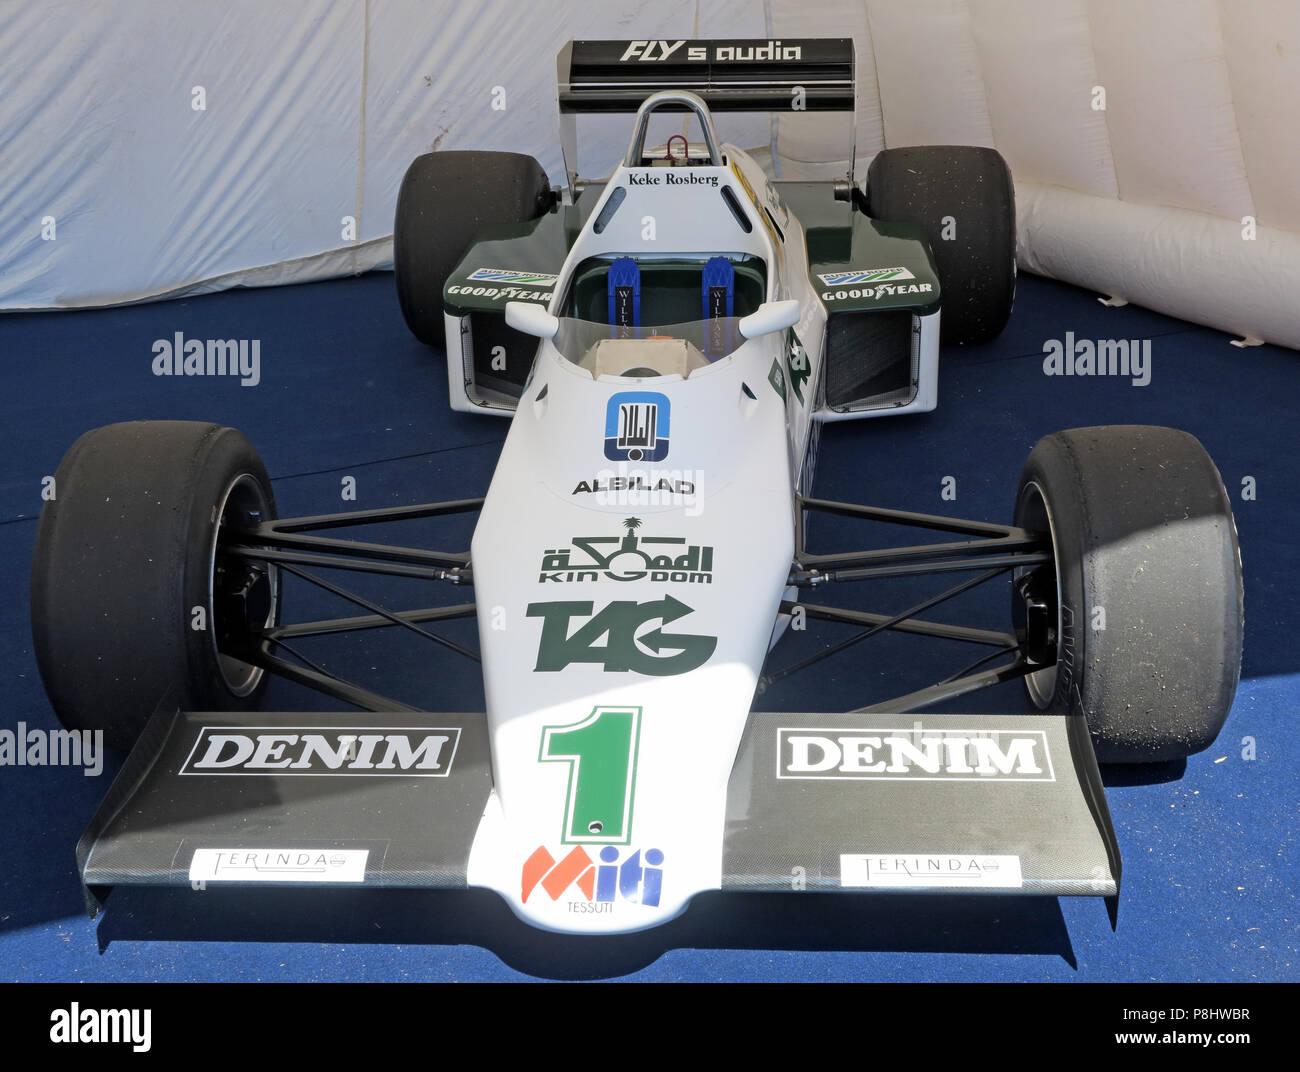 Keke Rosberg / Formula One F1 racing car, sponsored by Denim - Williams Cosworth FW08C driven by Ayrton Senna Stock Photo